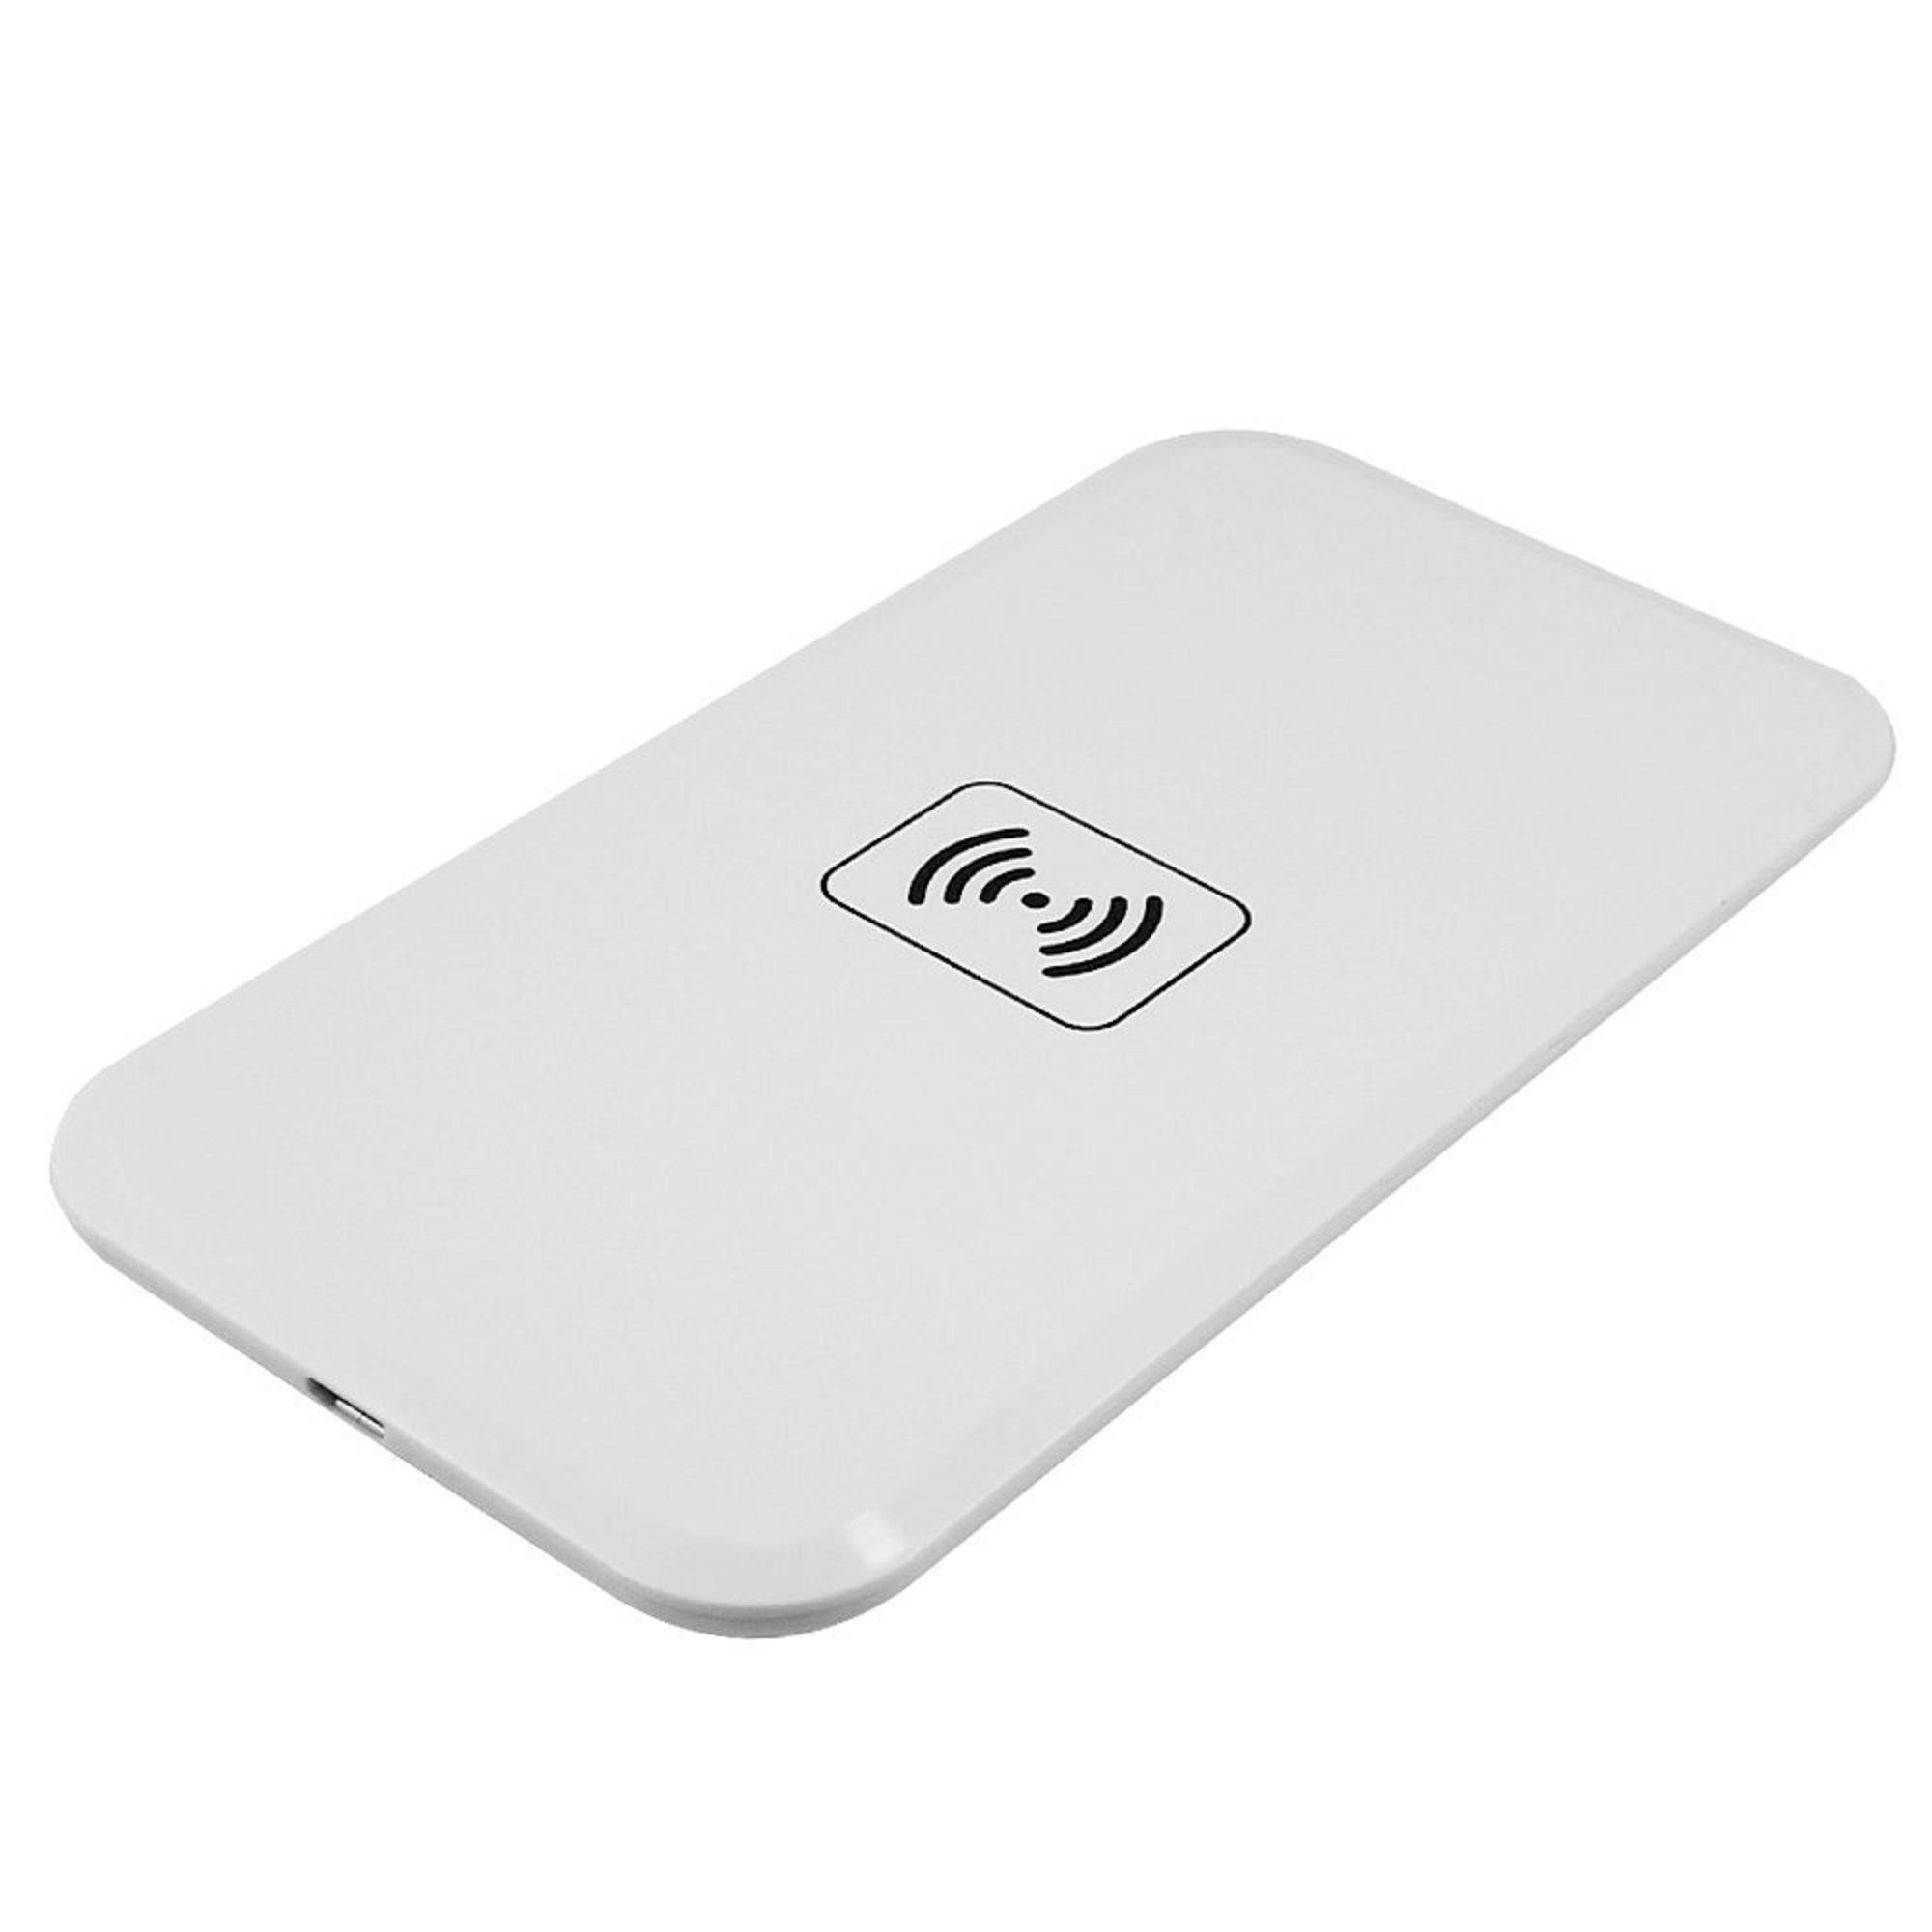 induktive ladestation wireless ladeger t qi kabellos apple iphone 8 8 plus x ebay. Black Bedroom Furniture Sets. Home Design Ideas